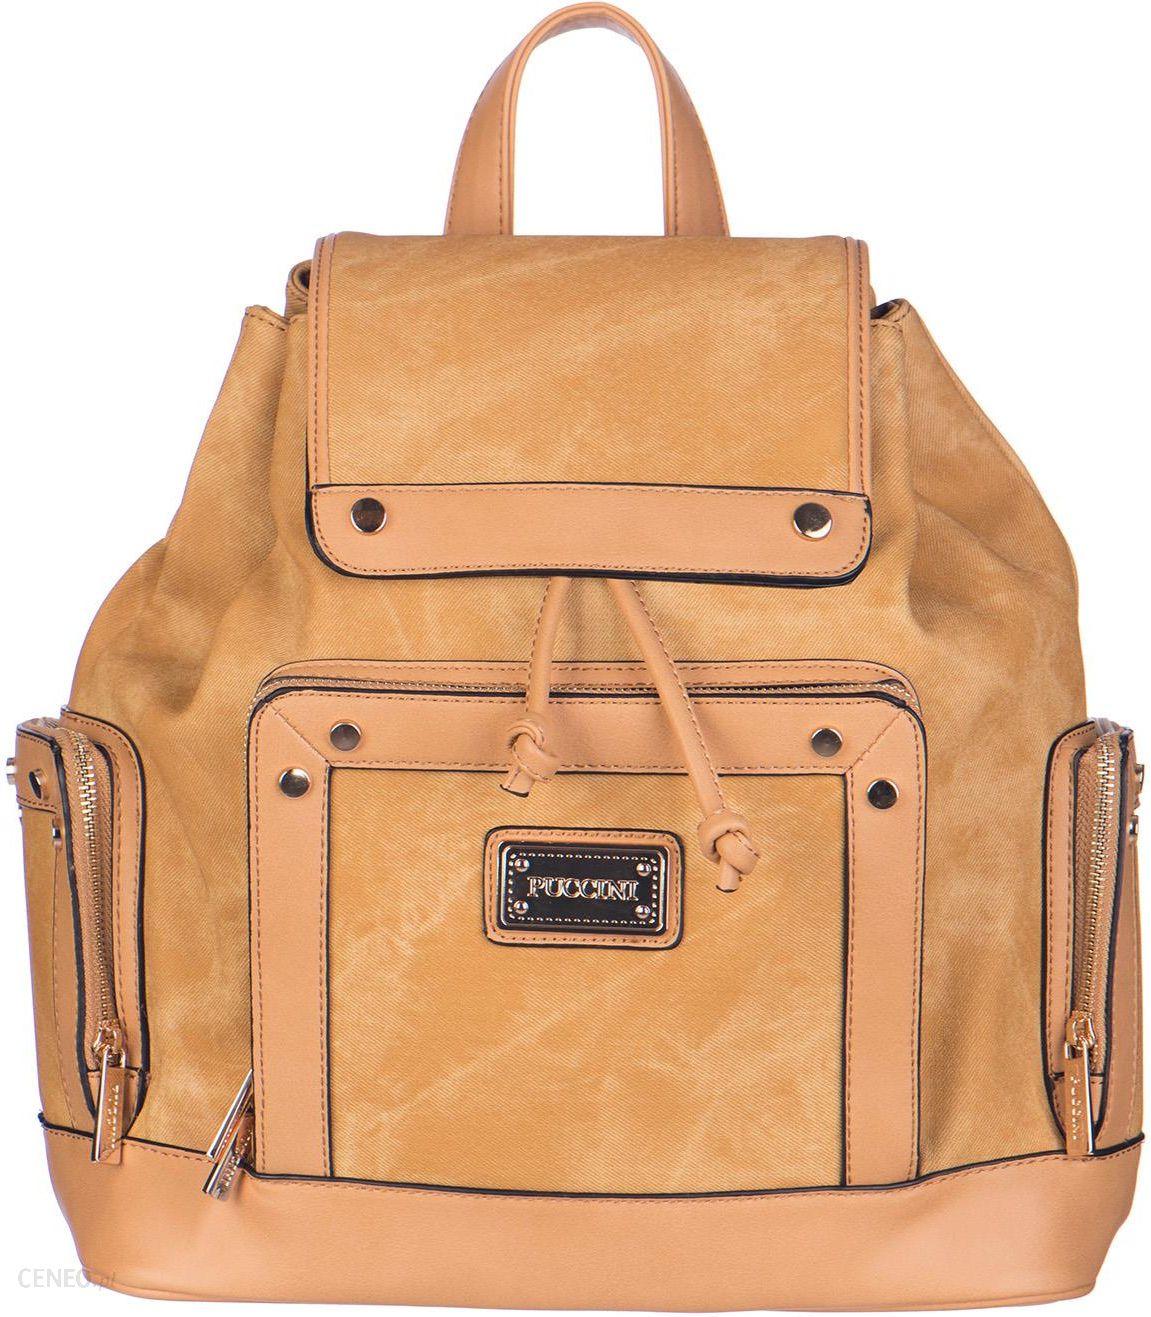 e18ed1896a801 Plecak Damski Fashion Collection - BC16302 6 - Ceny i opinie - Ceneo.pl